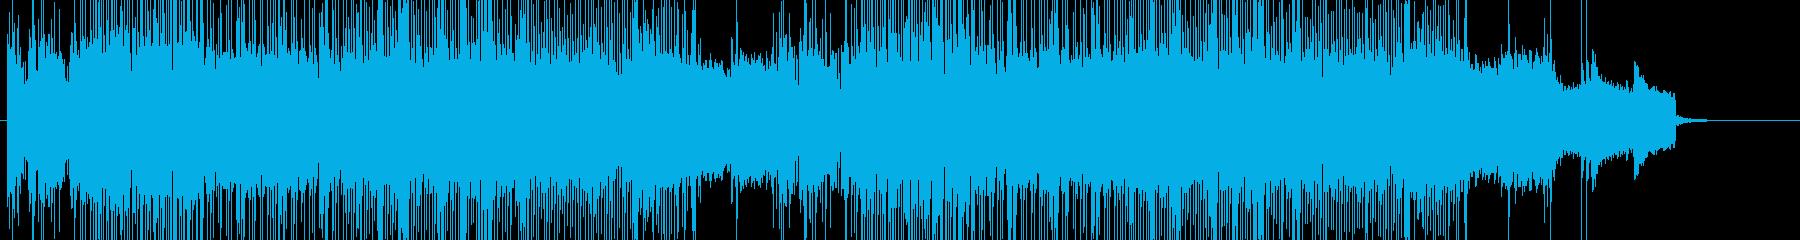 「HR/HM」「ROCK」BGM178の再生済みの波形